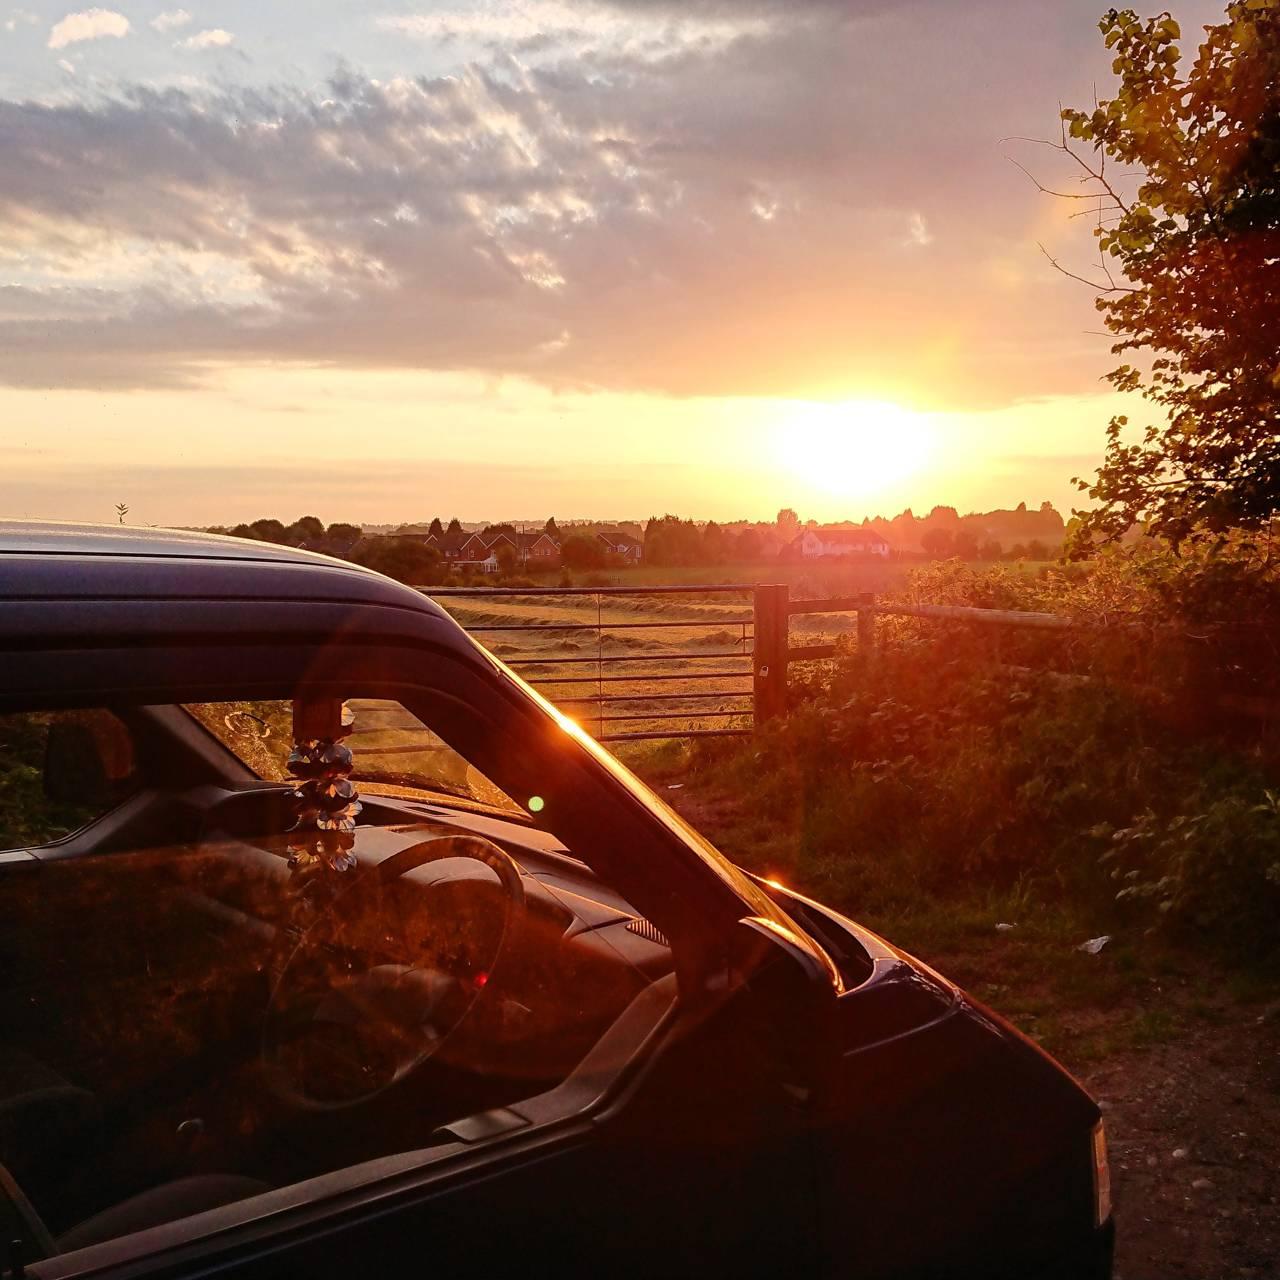 Volkswagen sunset